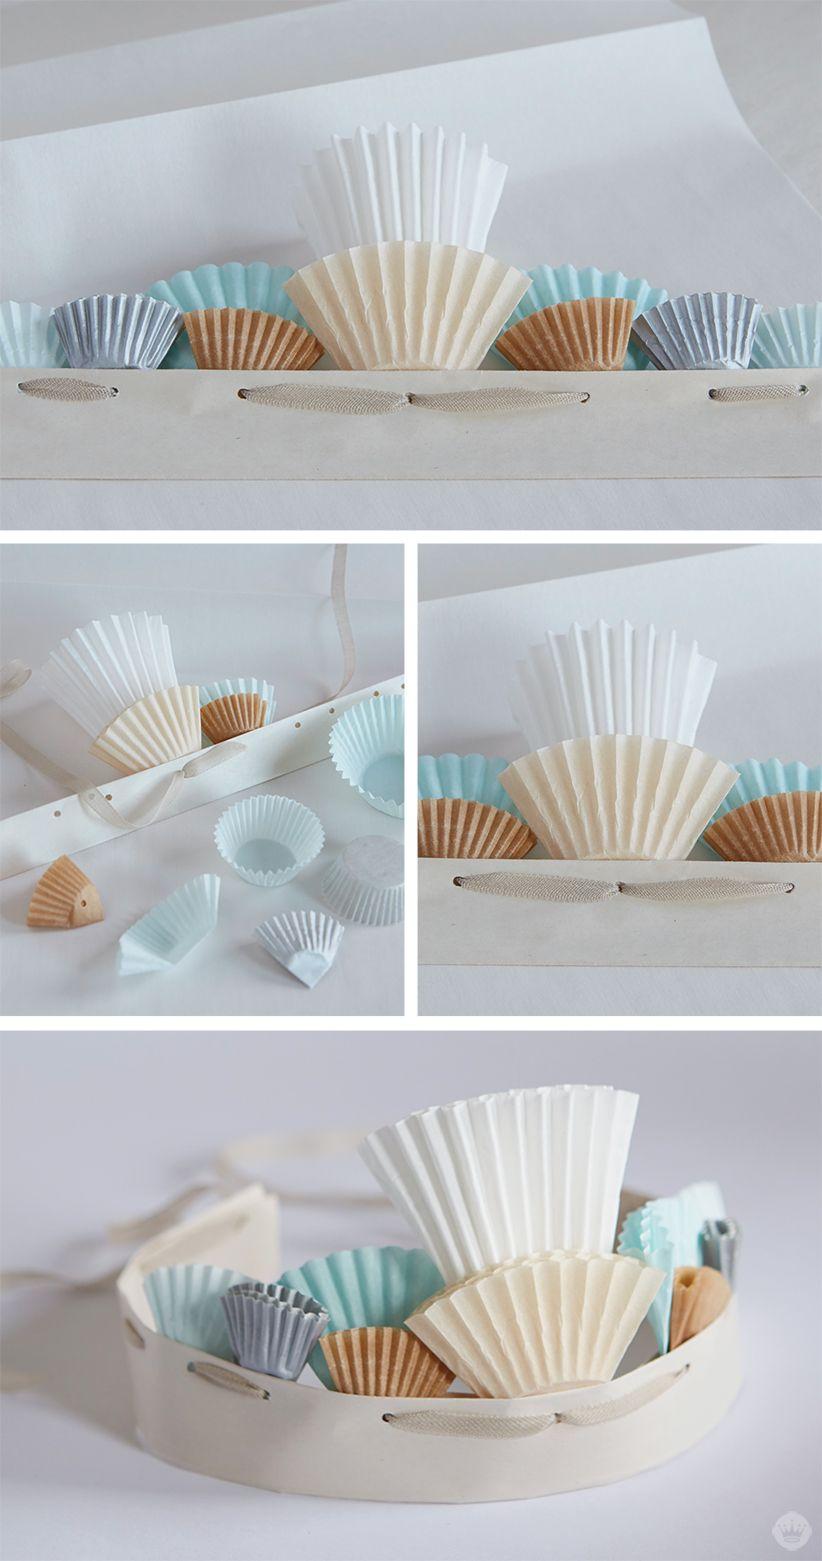 Cupcake paper crafts cupcake paper crafts cupcake garland and cupcake paper crafts jeuxipadfo Gallery